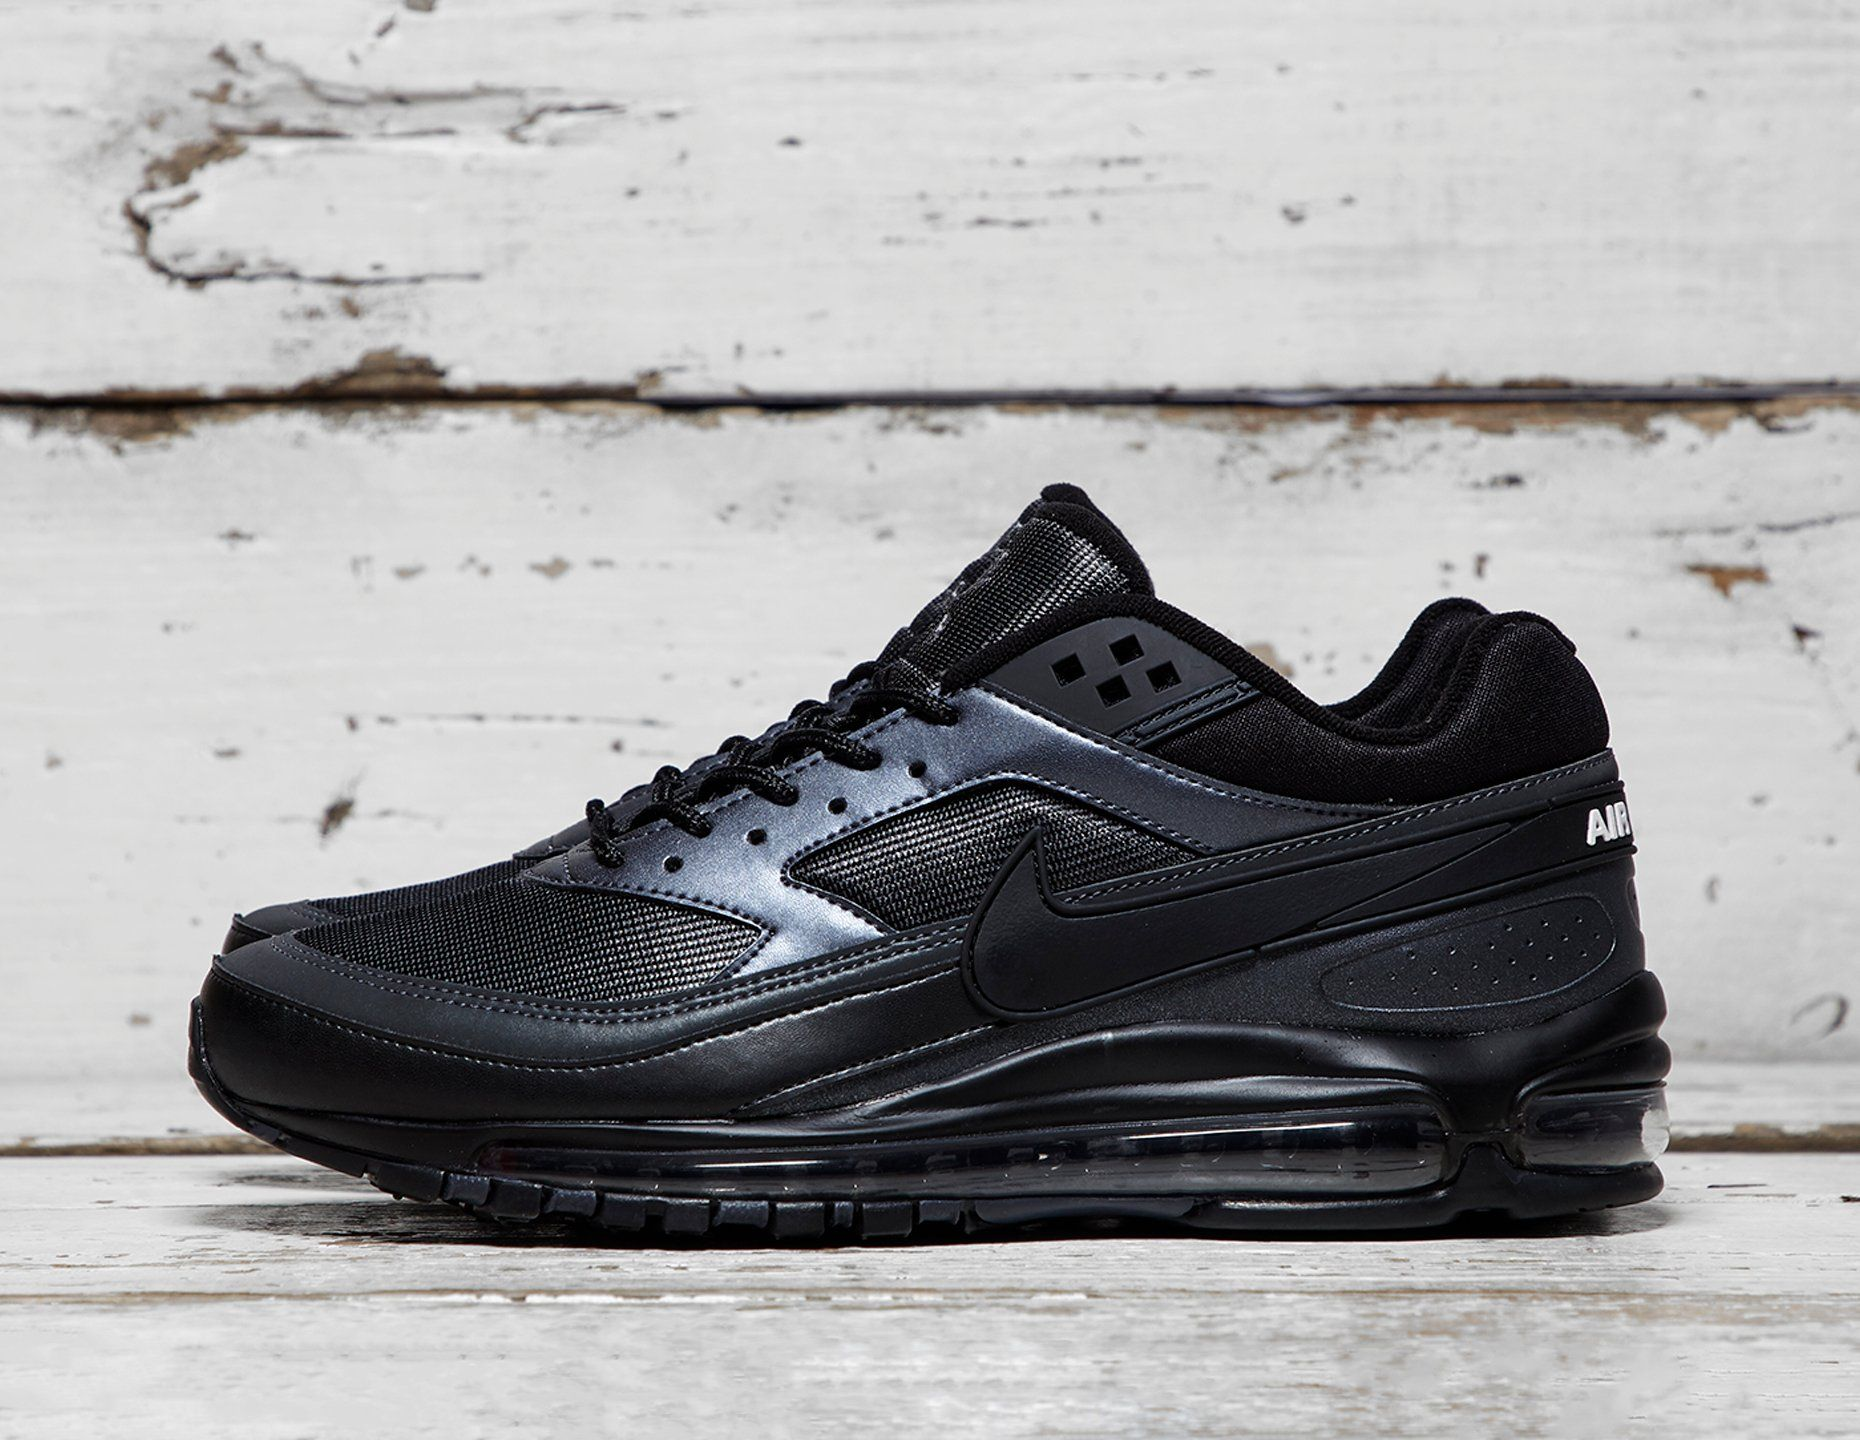 1e0bf7e68422 Nike Air Max 97 BW